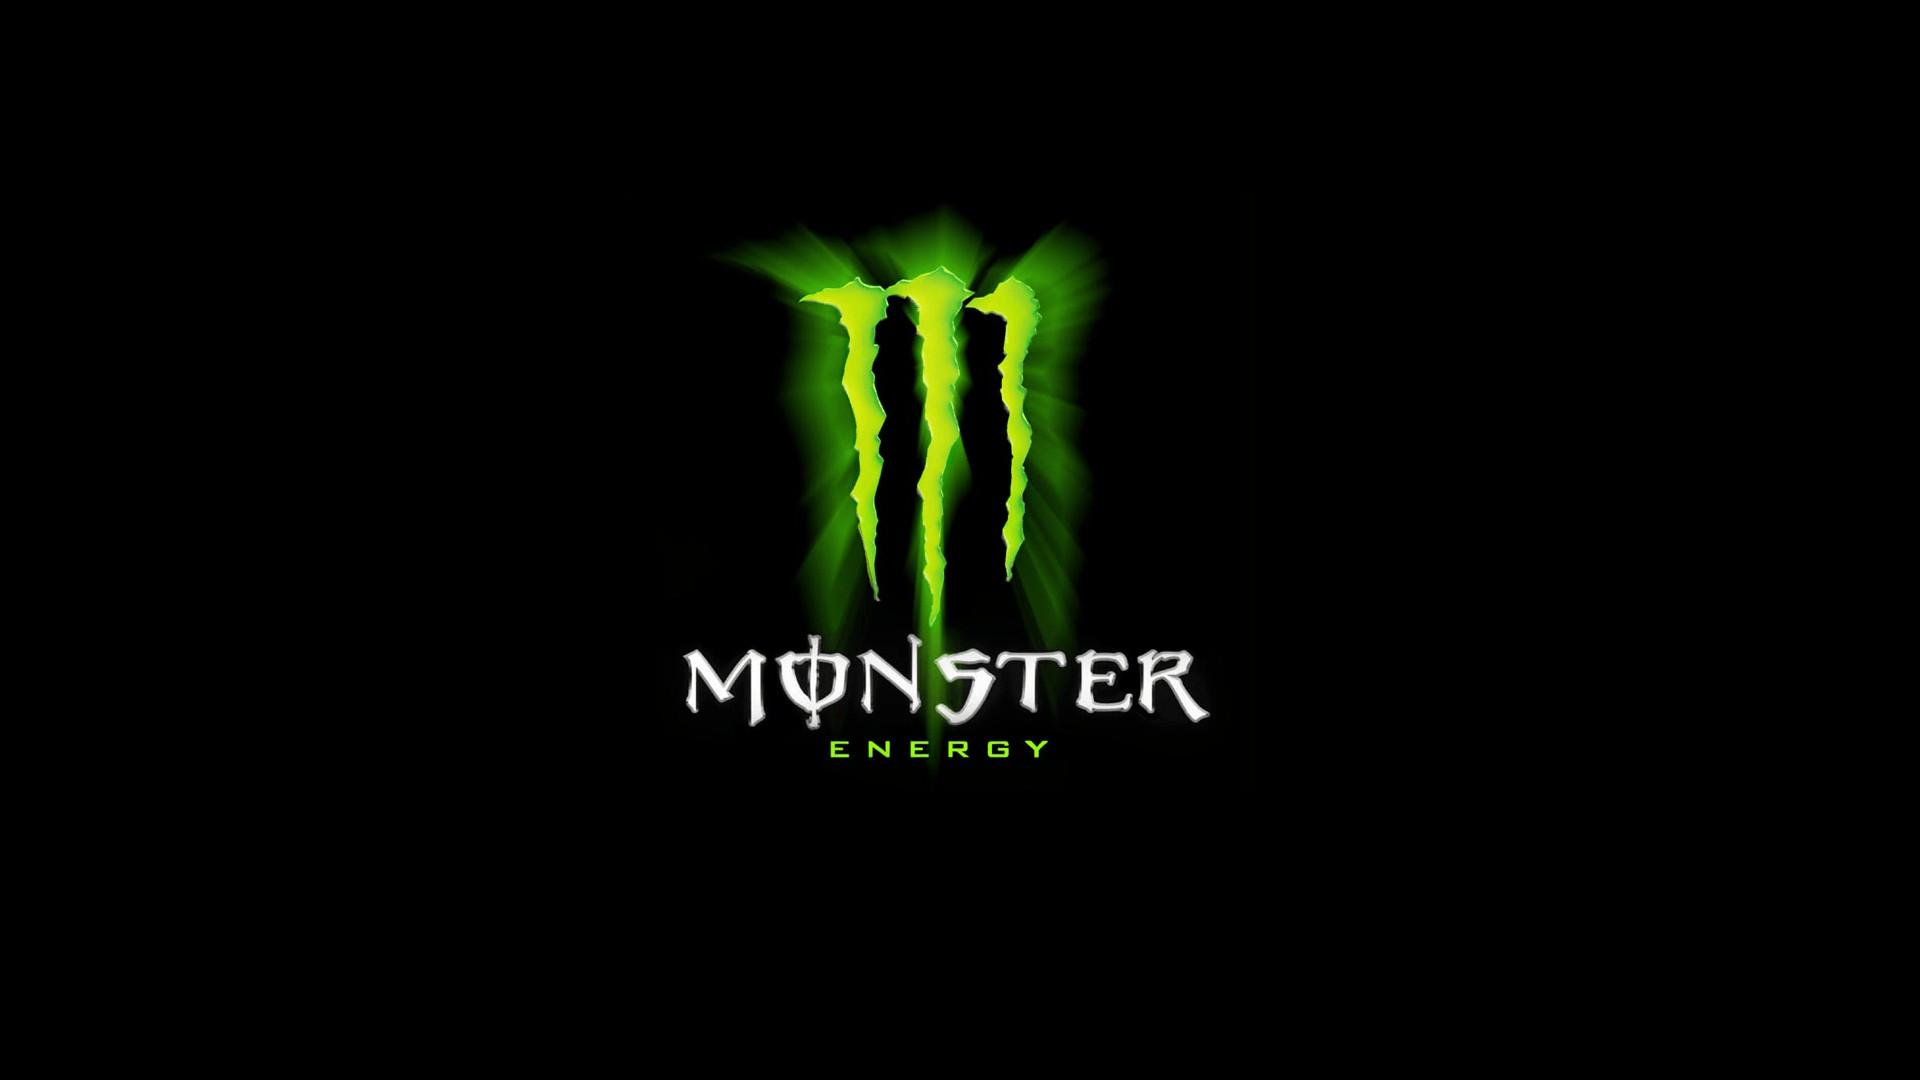 1920x1080 Monster Energy Logo Wallpapers   Wallpaper Cave